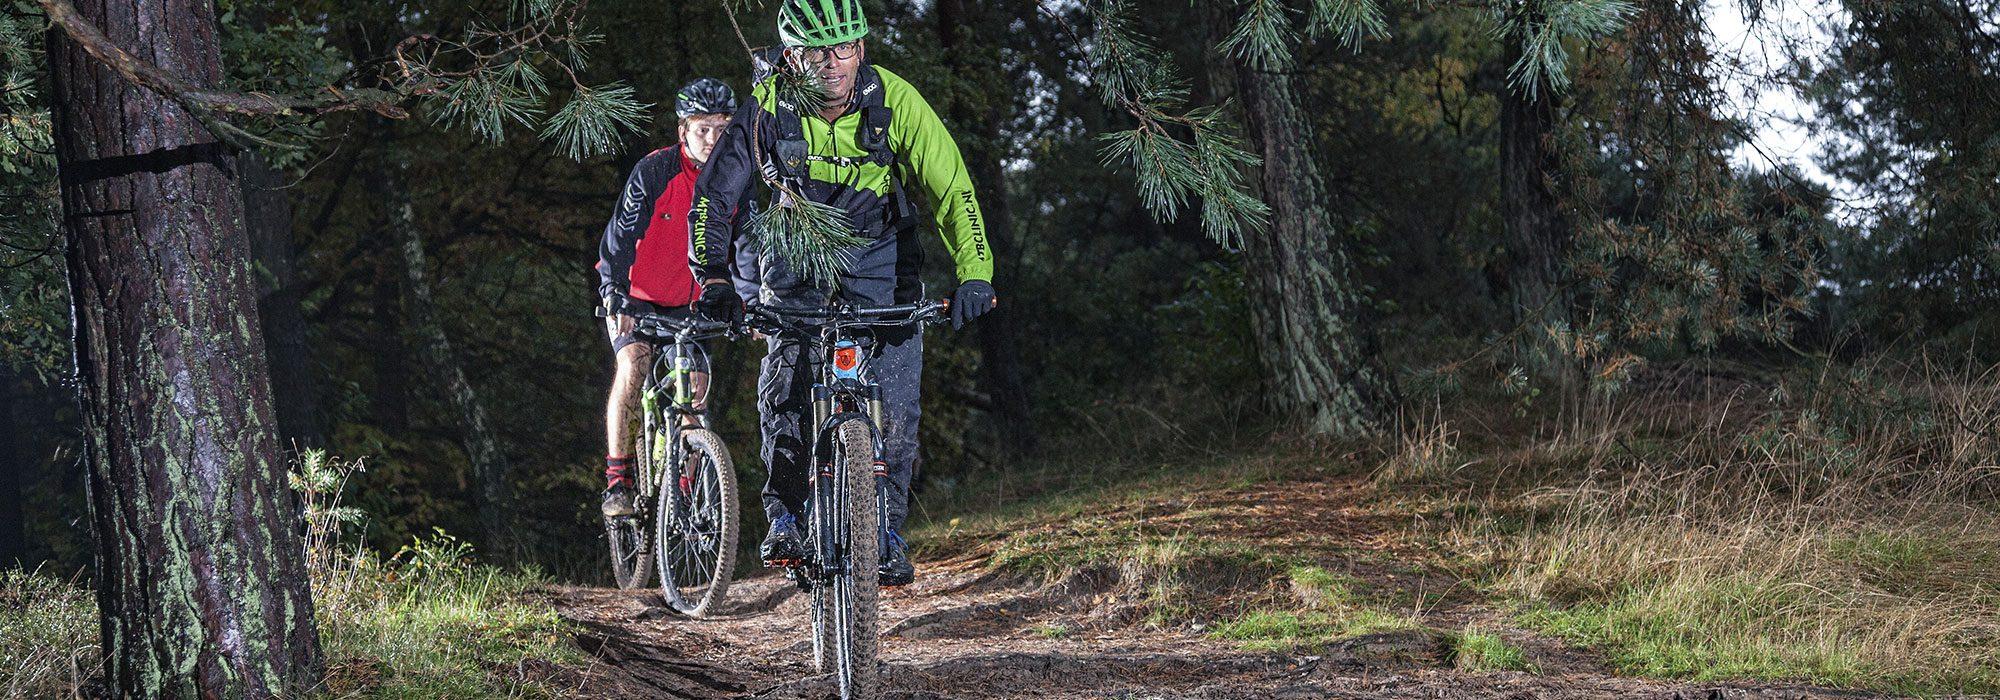 mtbclinic.nl mountainbike clinics bedrijfsuitje